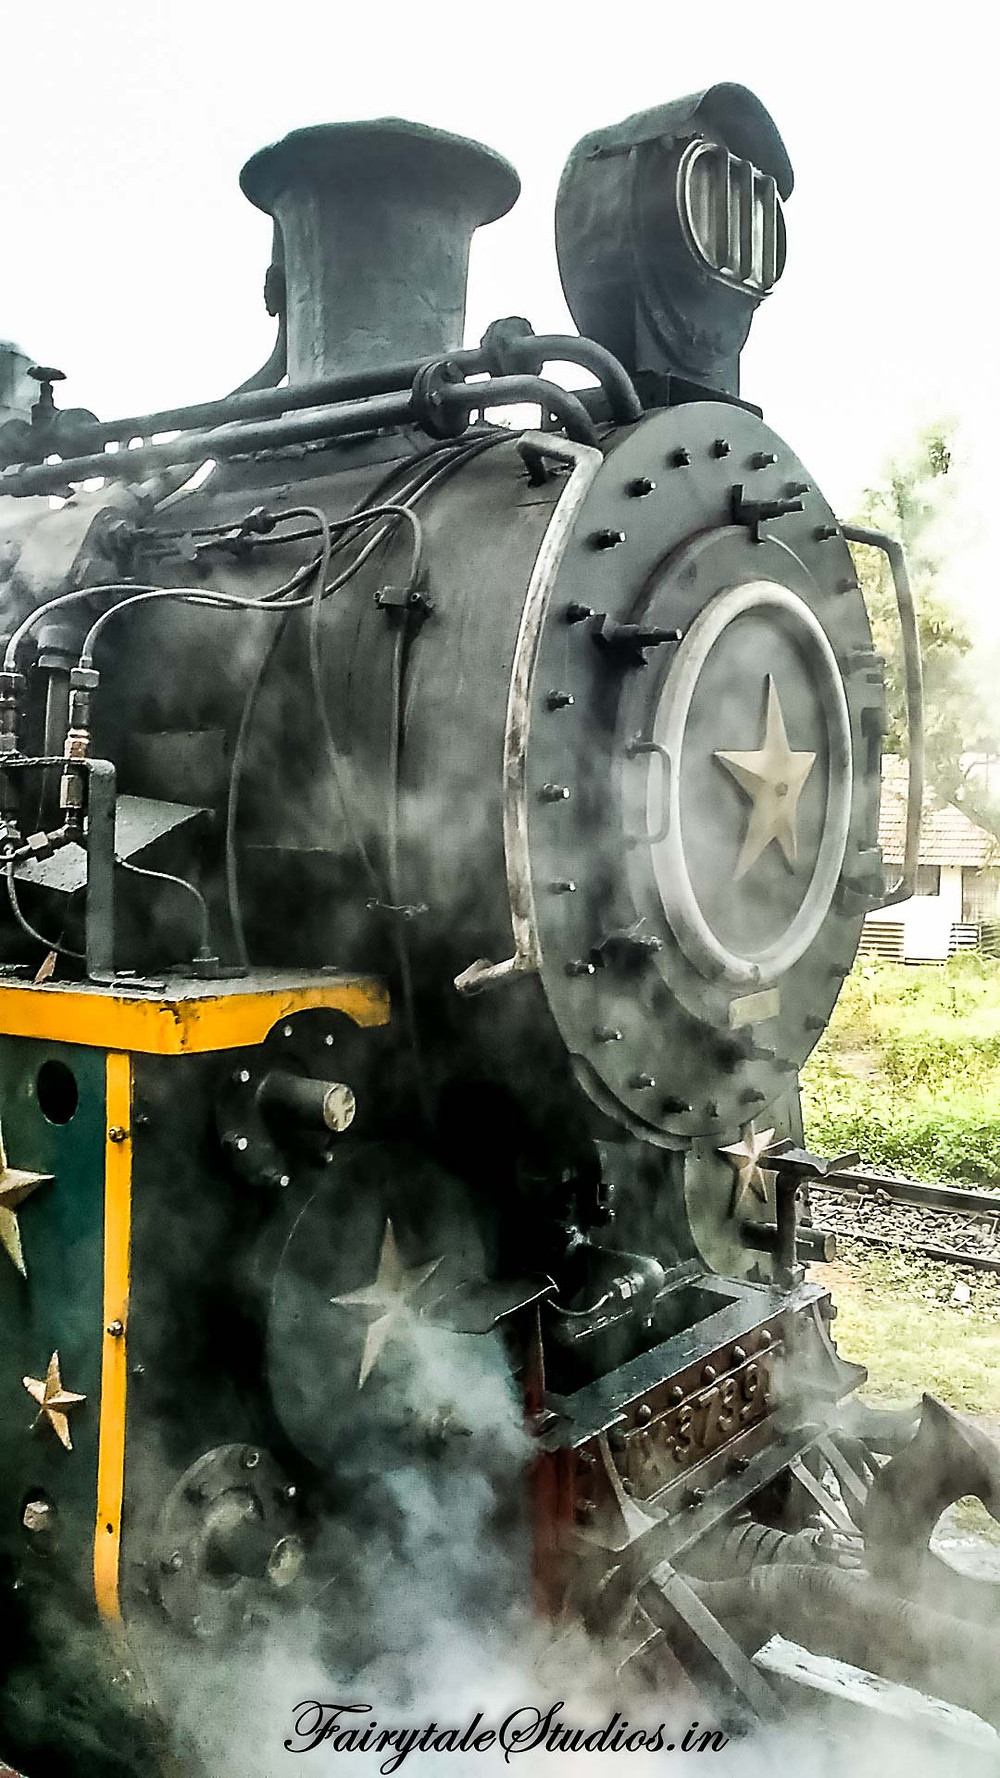 The steam engine of Nilgiri Mountain rail in all its glory